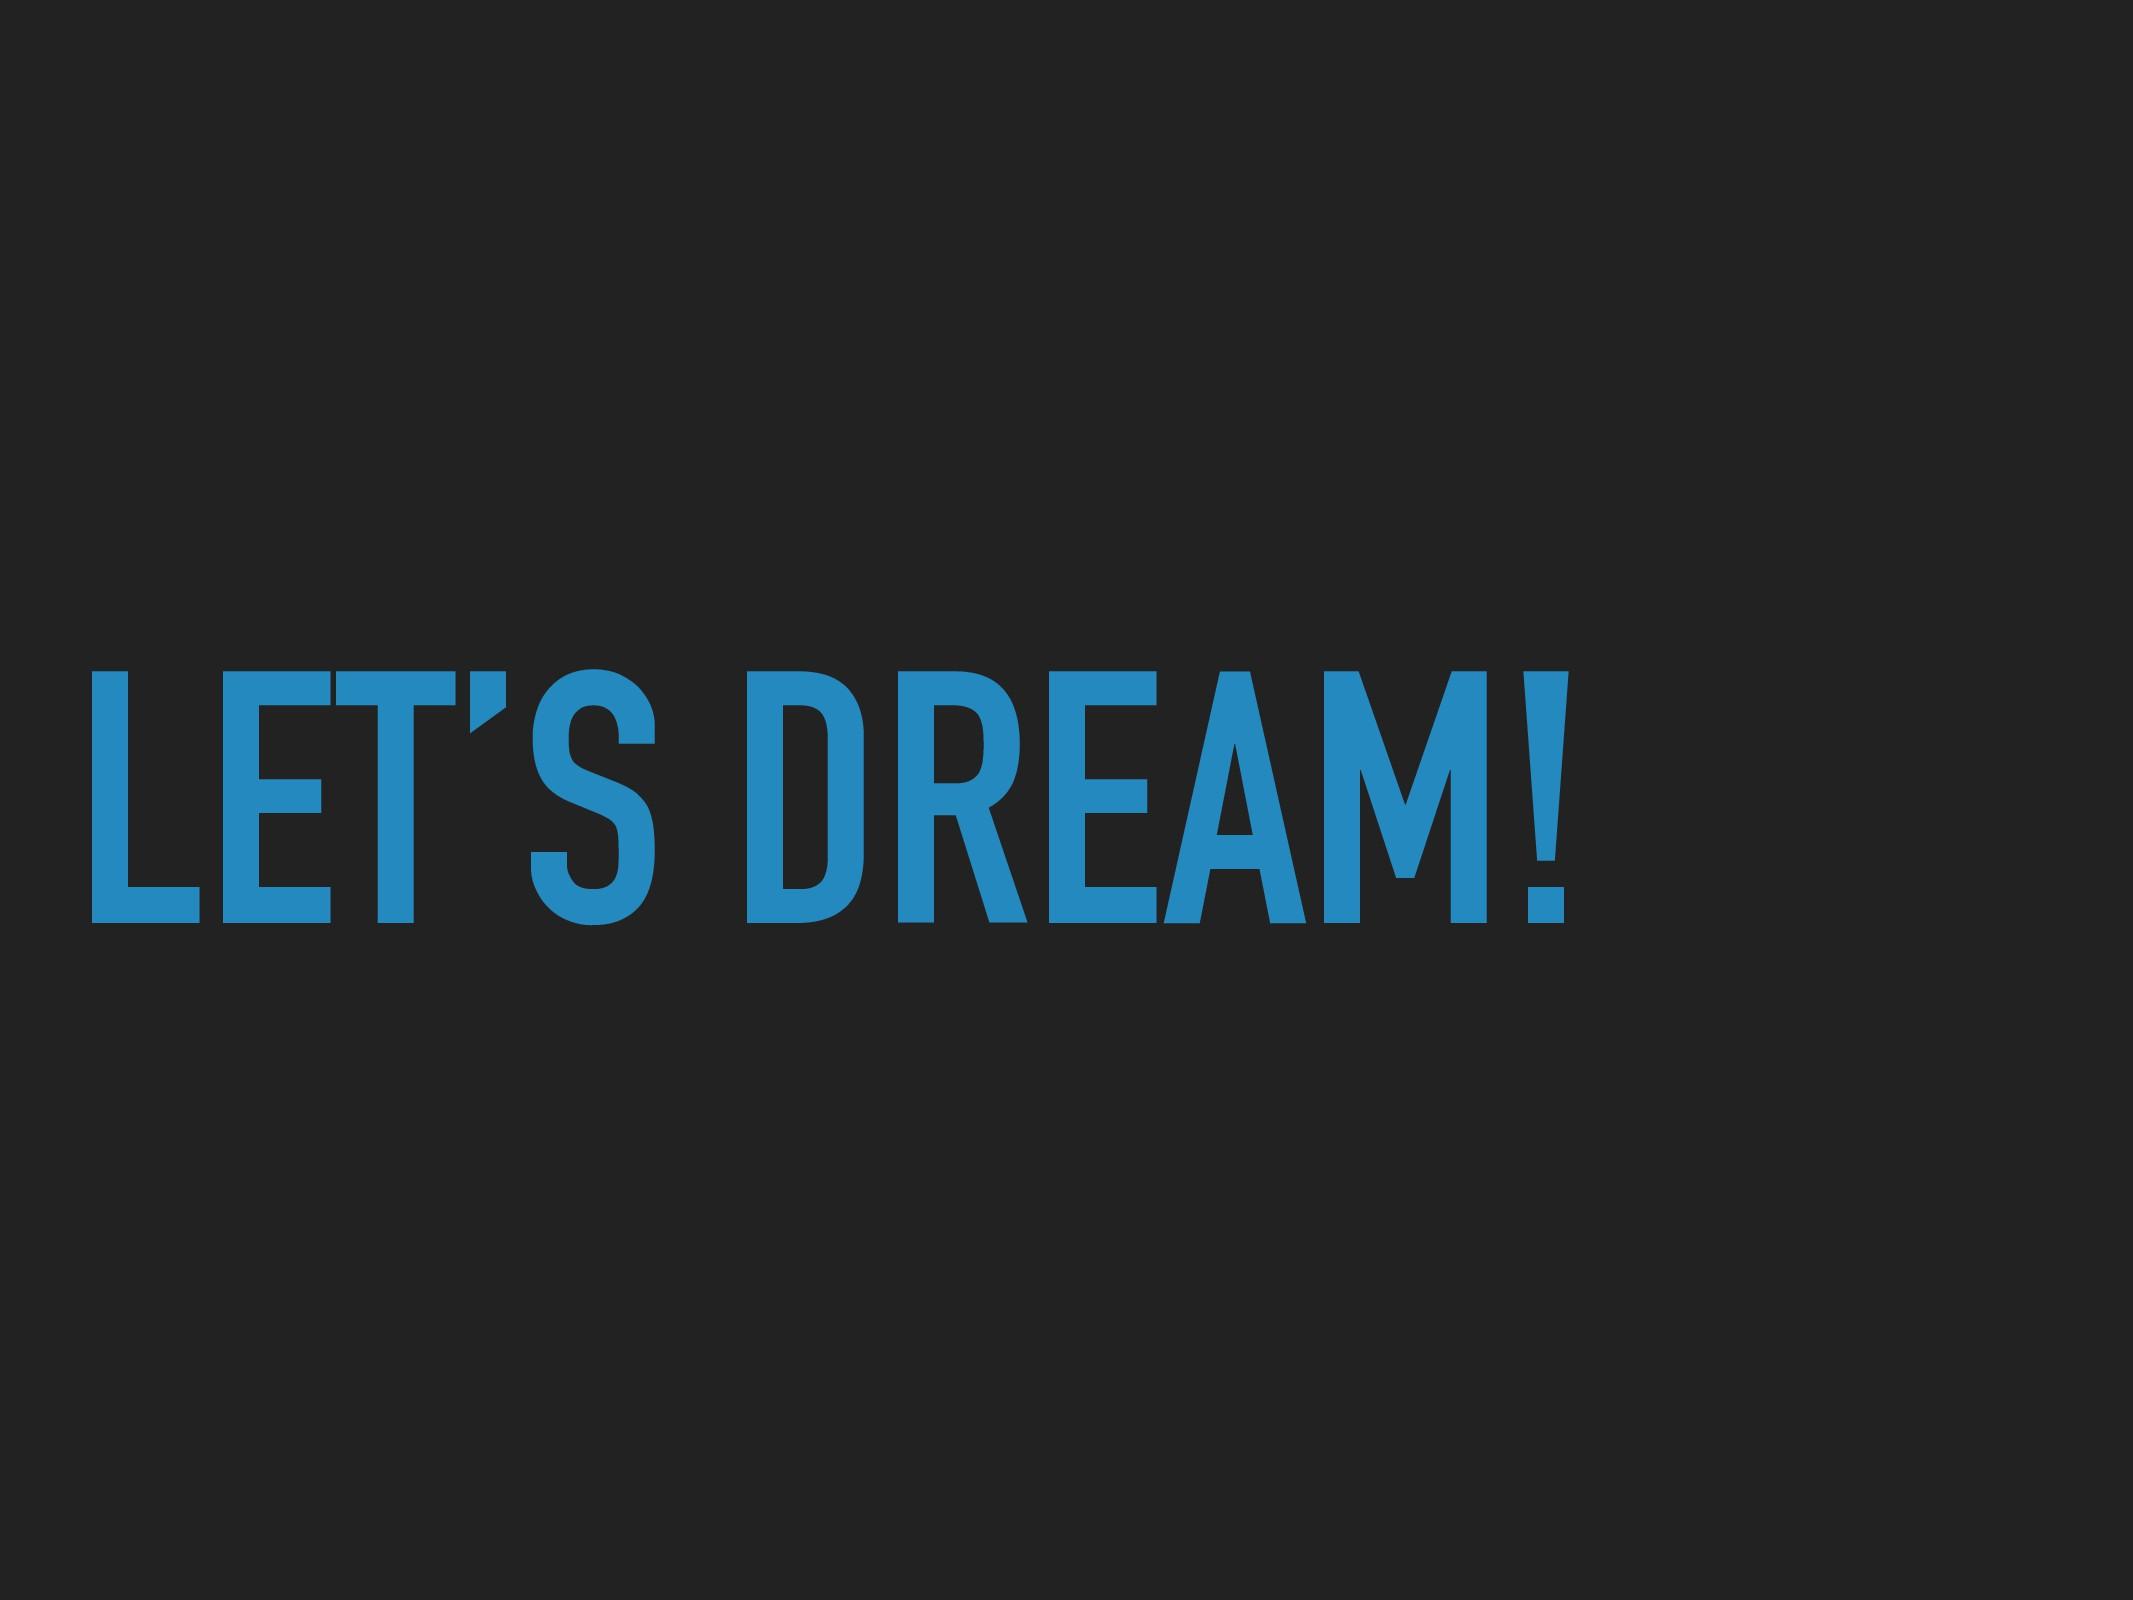 LET'S DREAM!